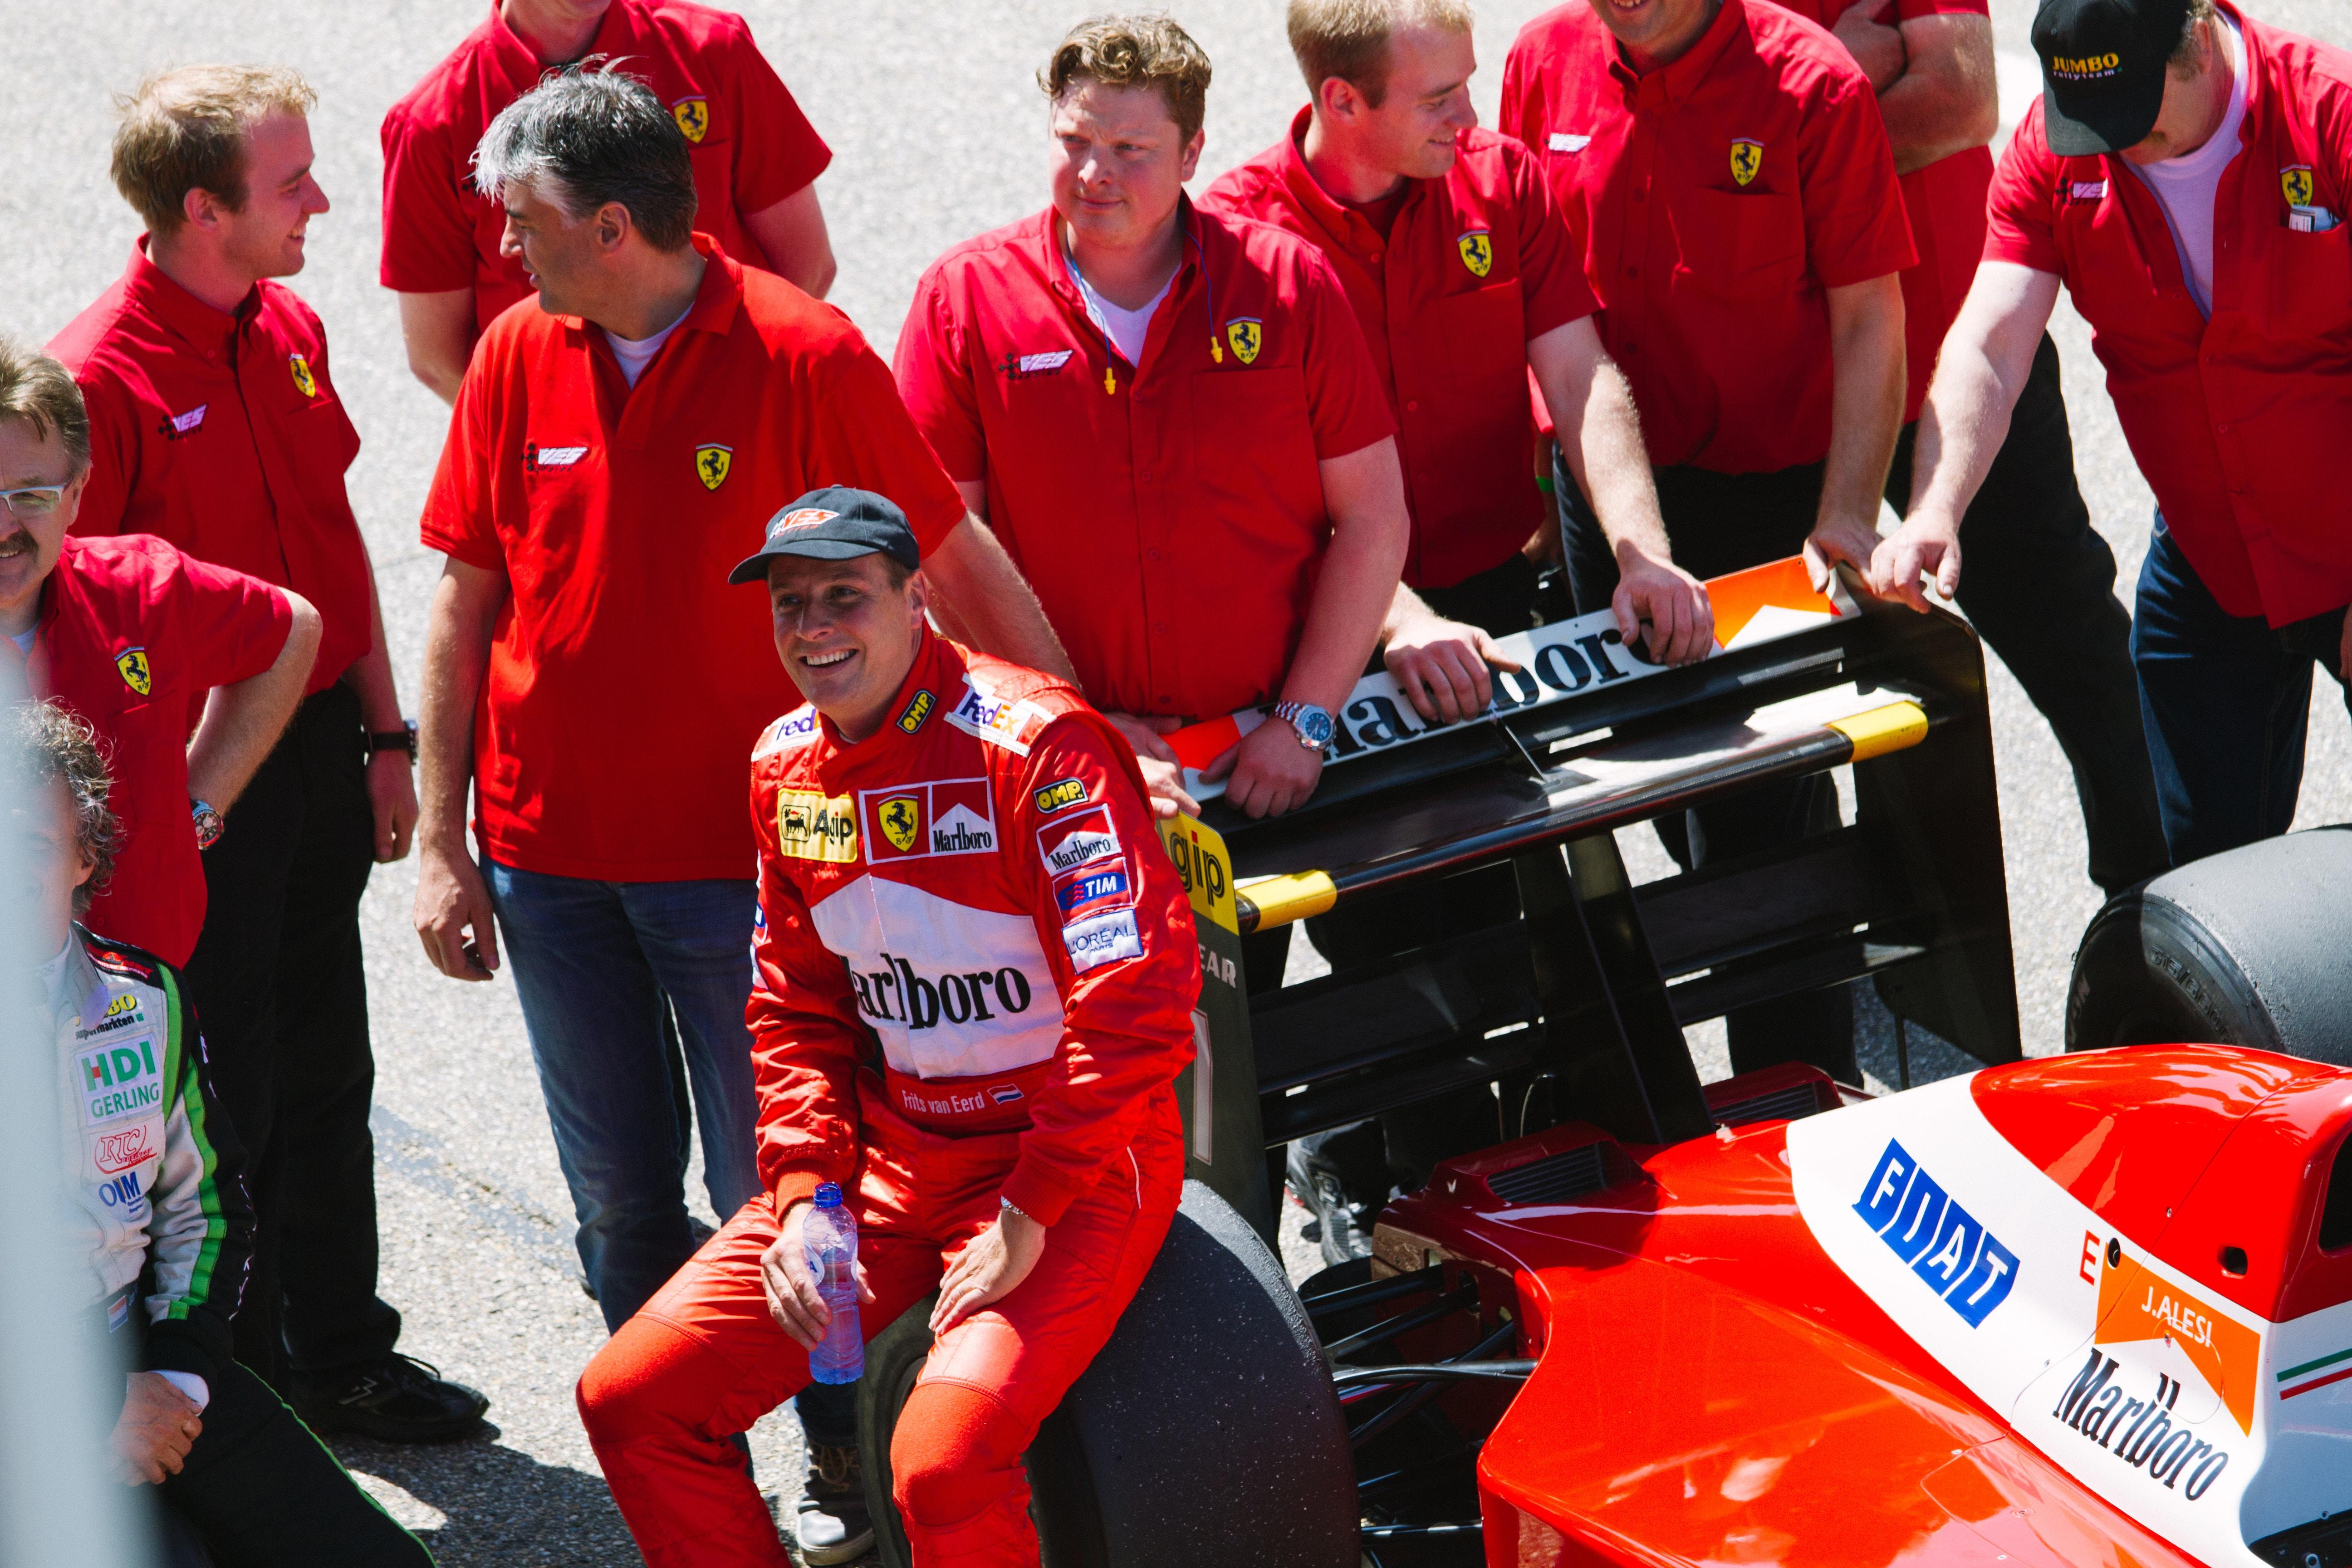 22 Feb: arriva la nuova monoposto Ferrari